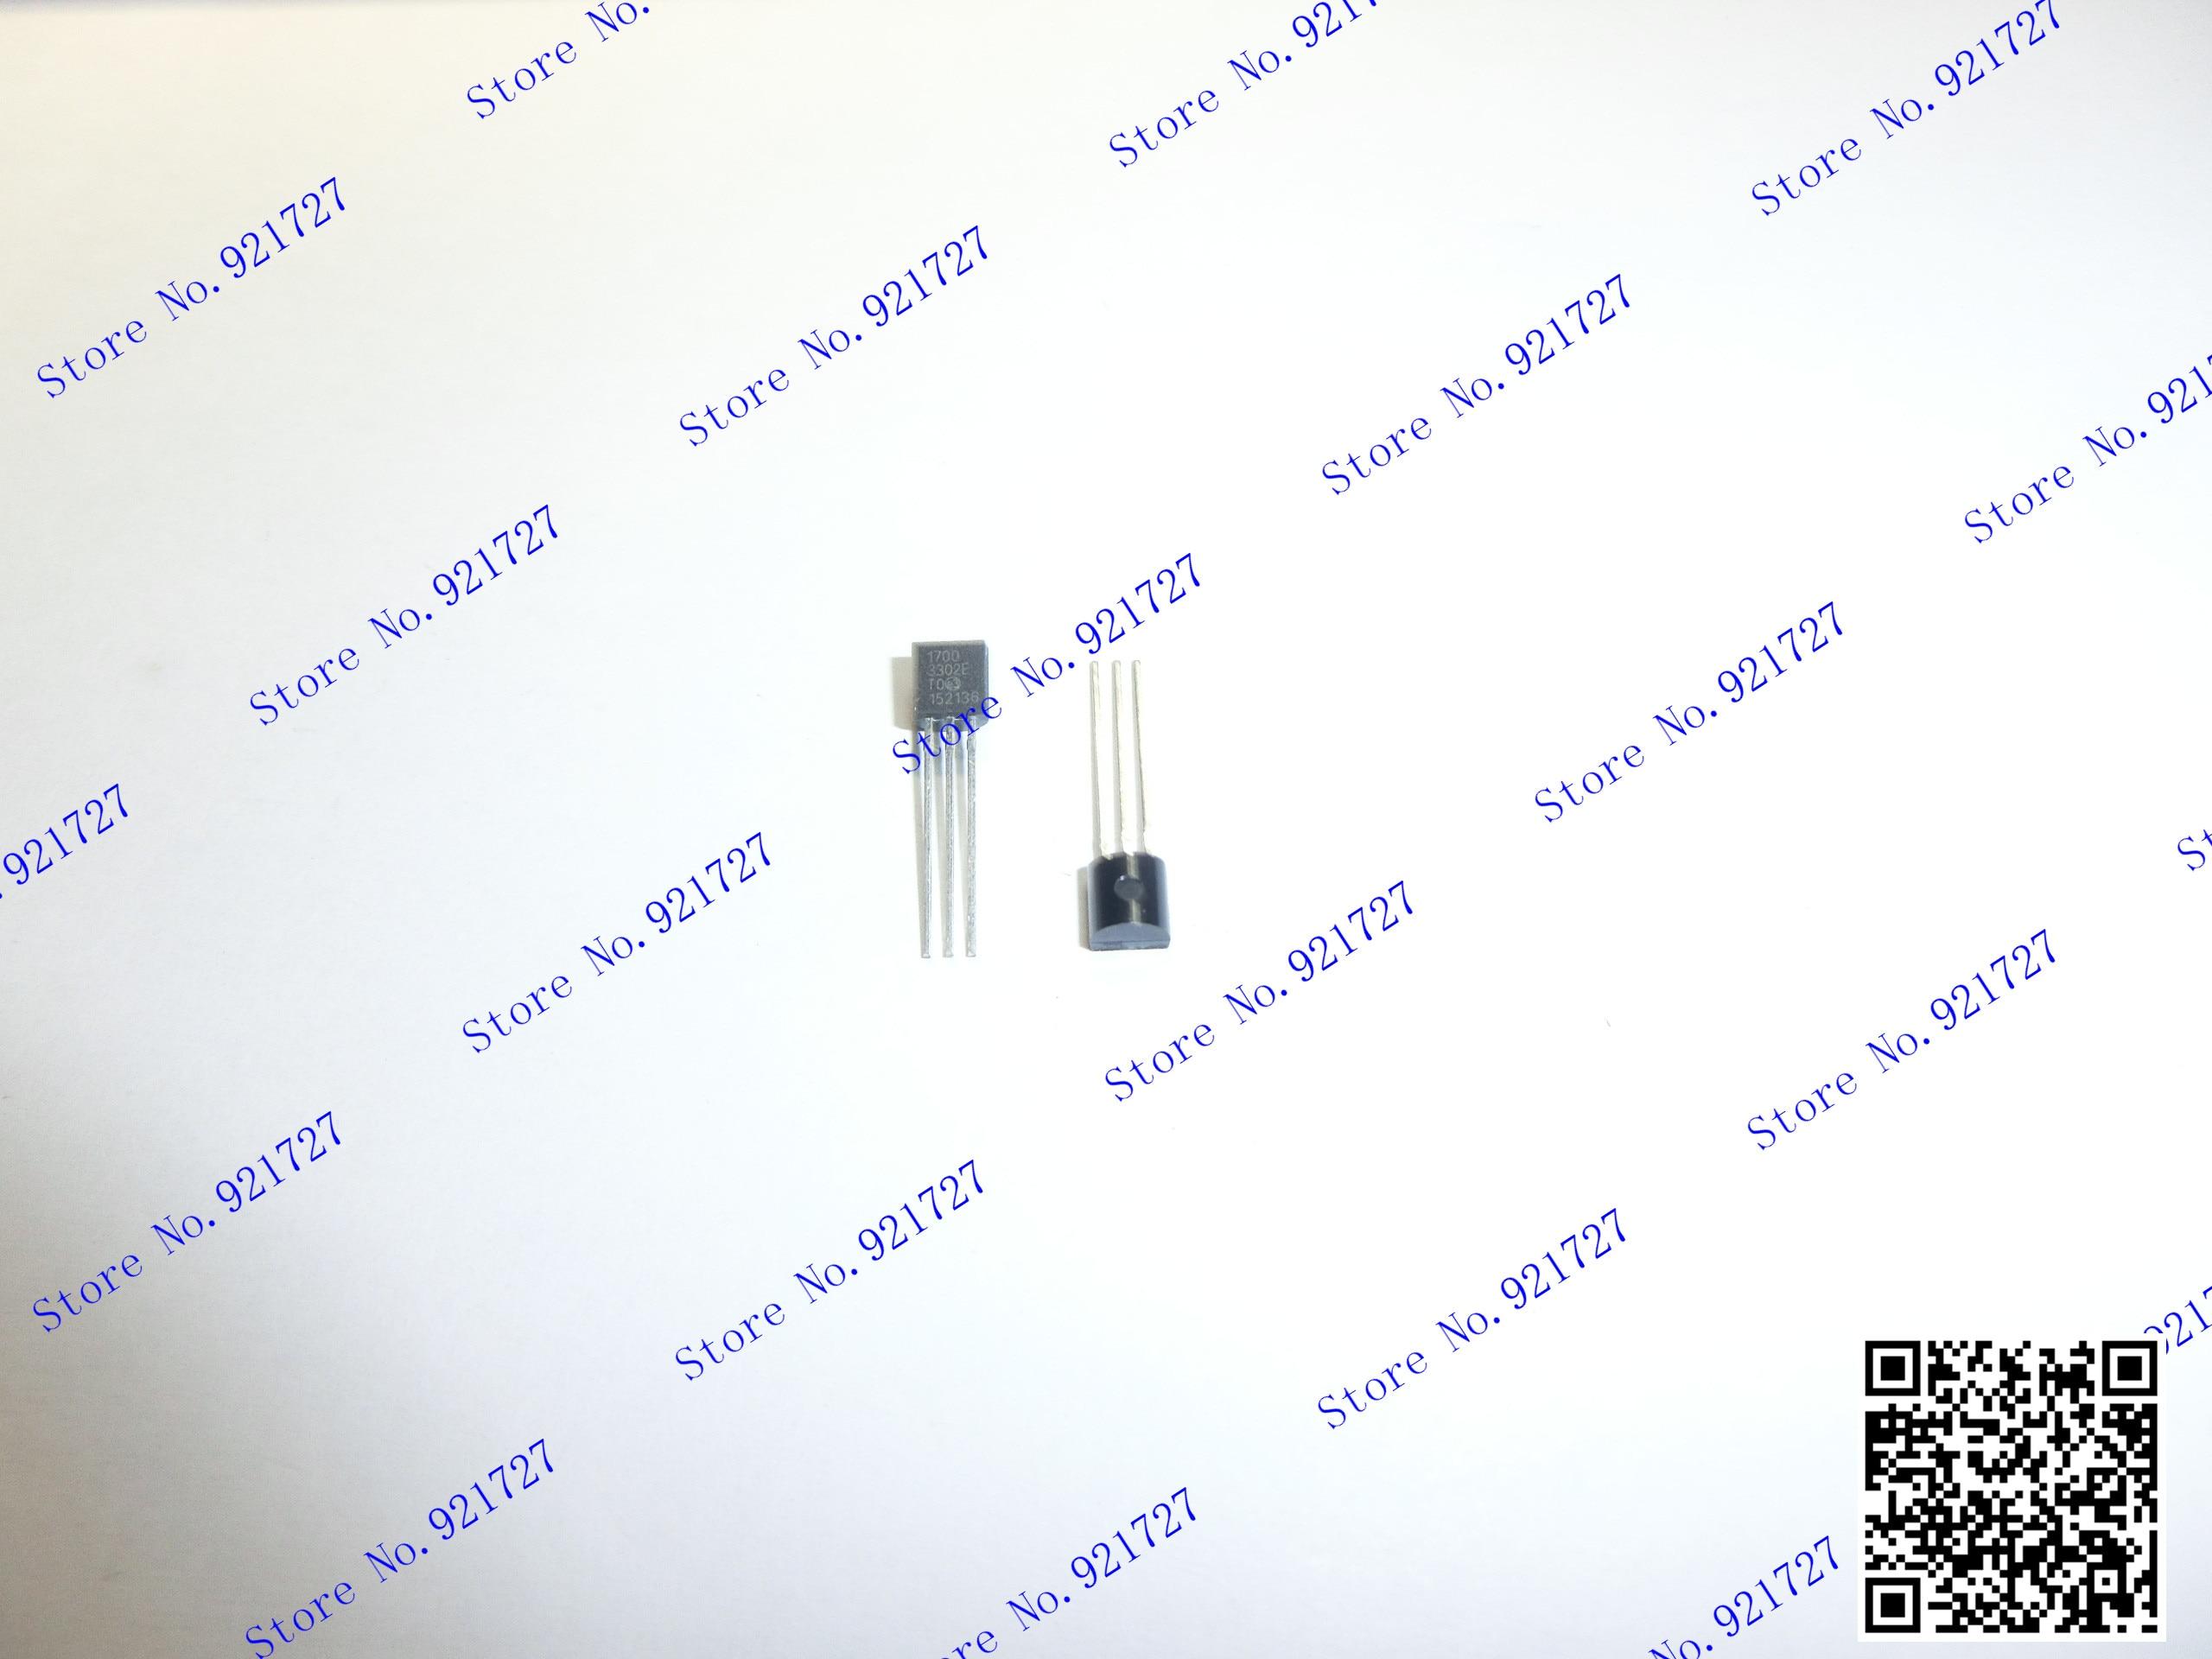 MCP1700-3302E/TO MCP1700 3302E 1700 TO92 20PCS